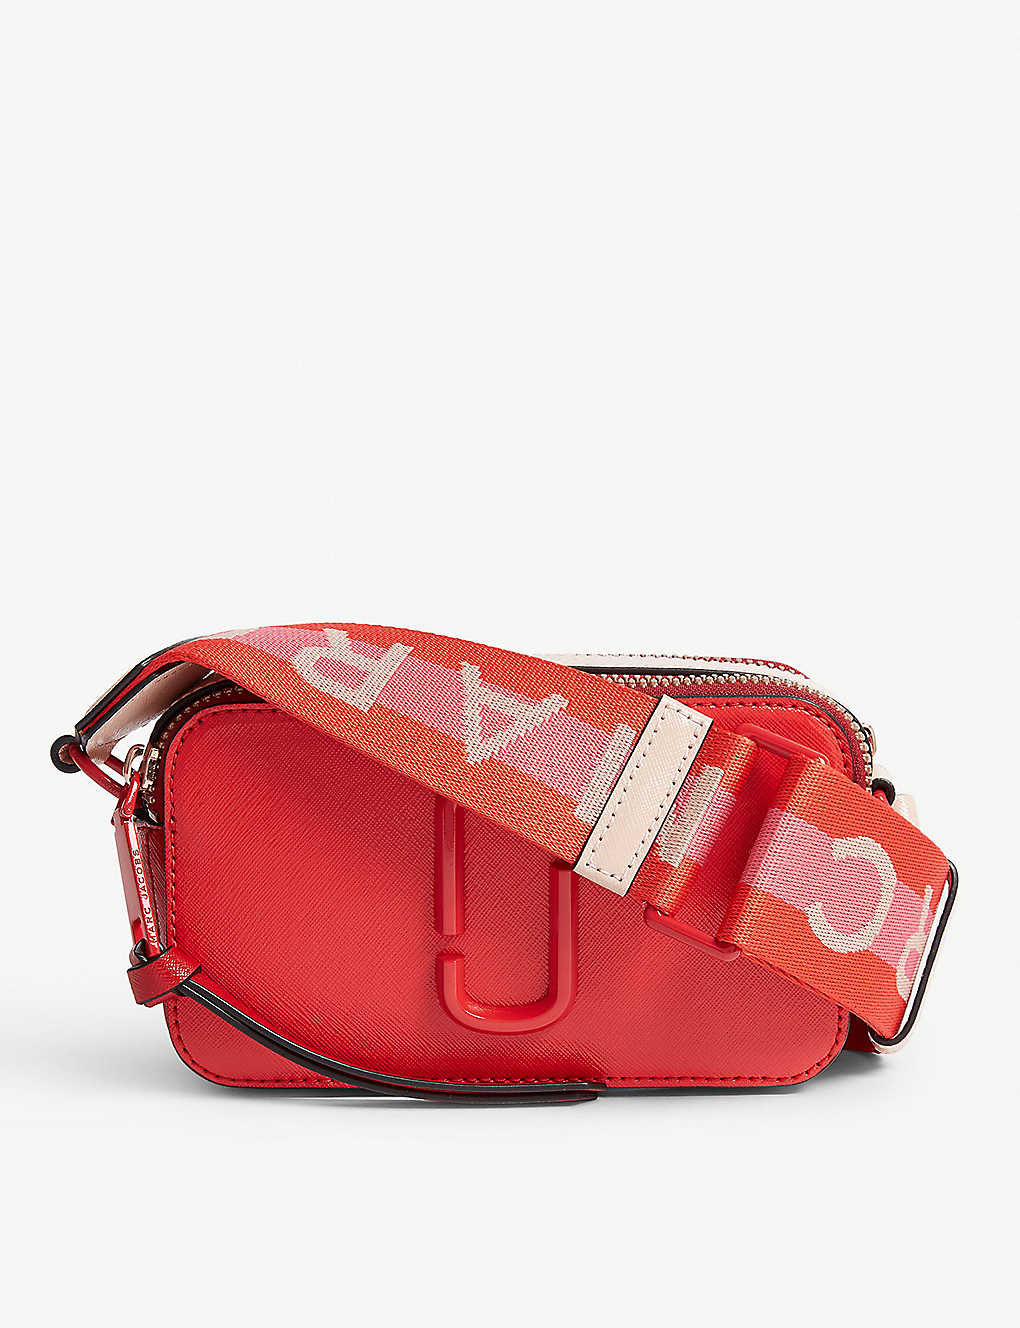 8eb71026015 MARC JACOBS - Snapshot saffiano leather camera bag | Selfridges.com